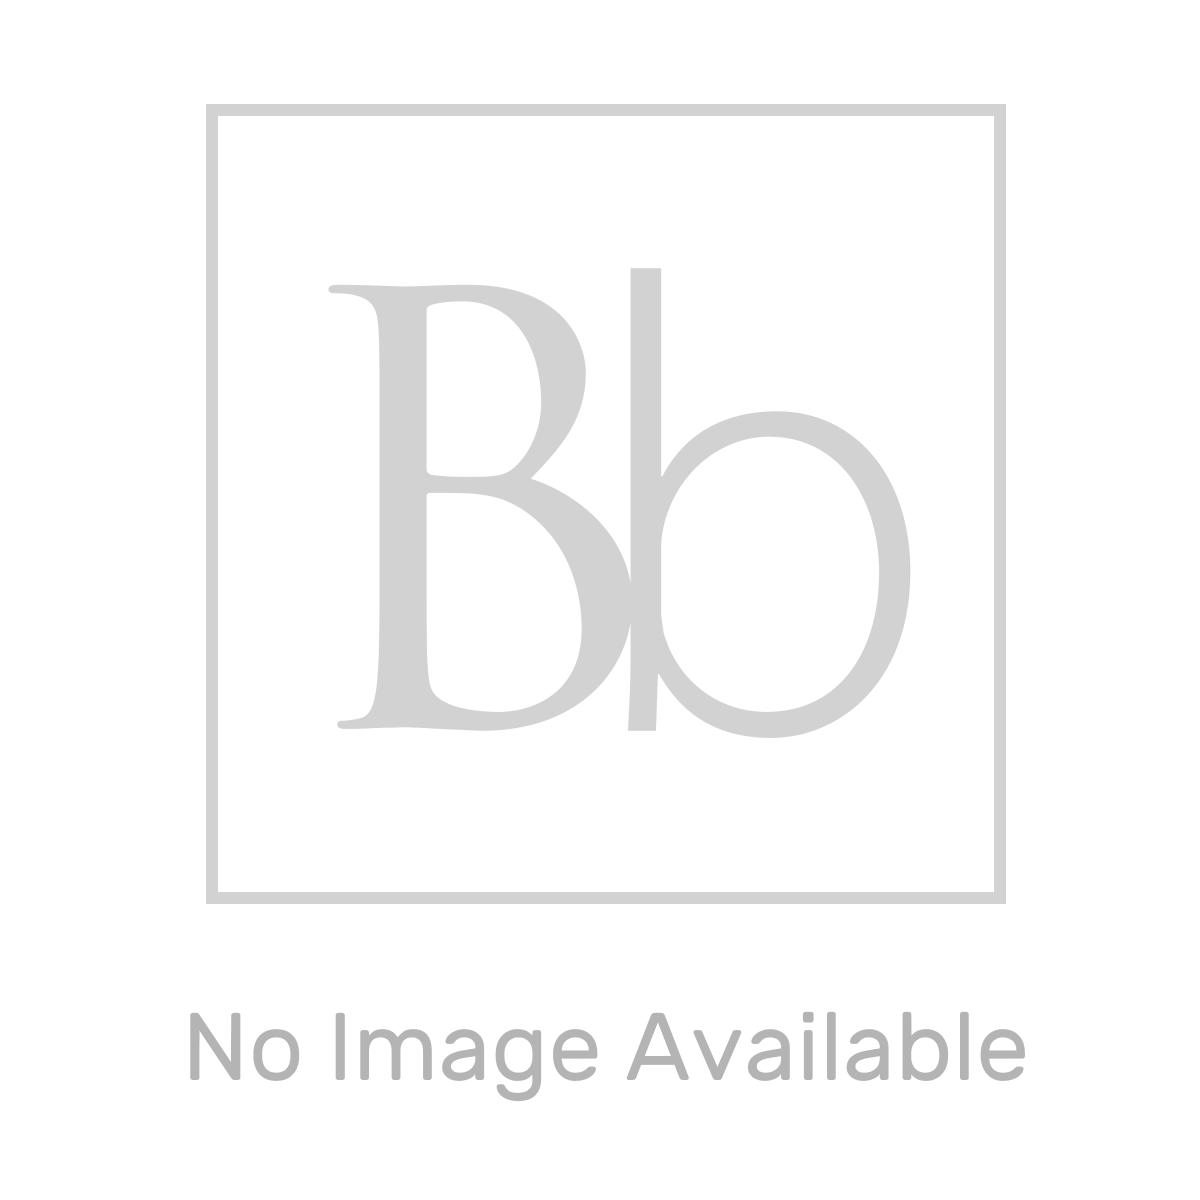 Nuie Vault Stone Grey Wall Hung Single Door Vanity & Basin 400mm Line Drawing